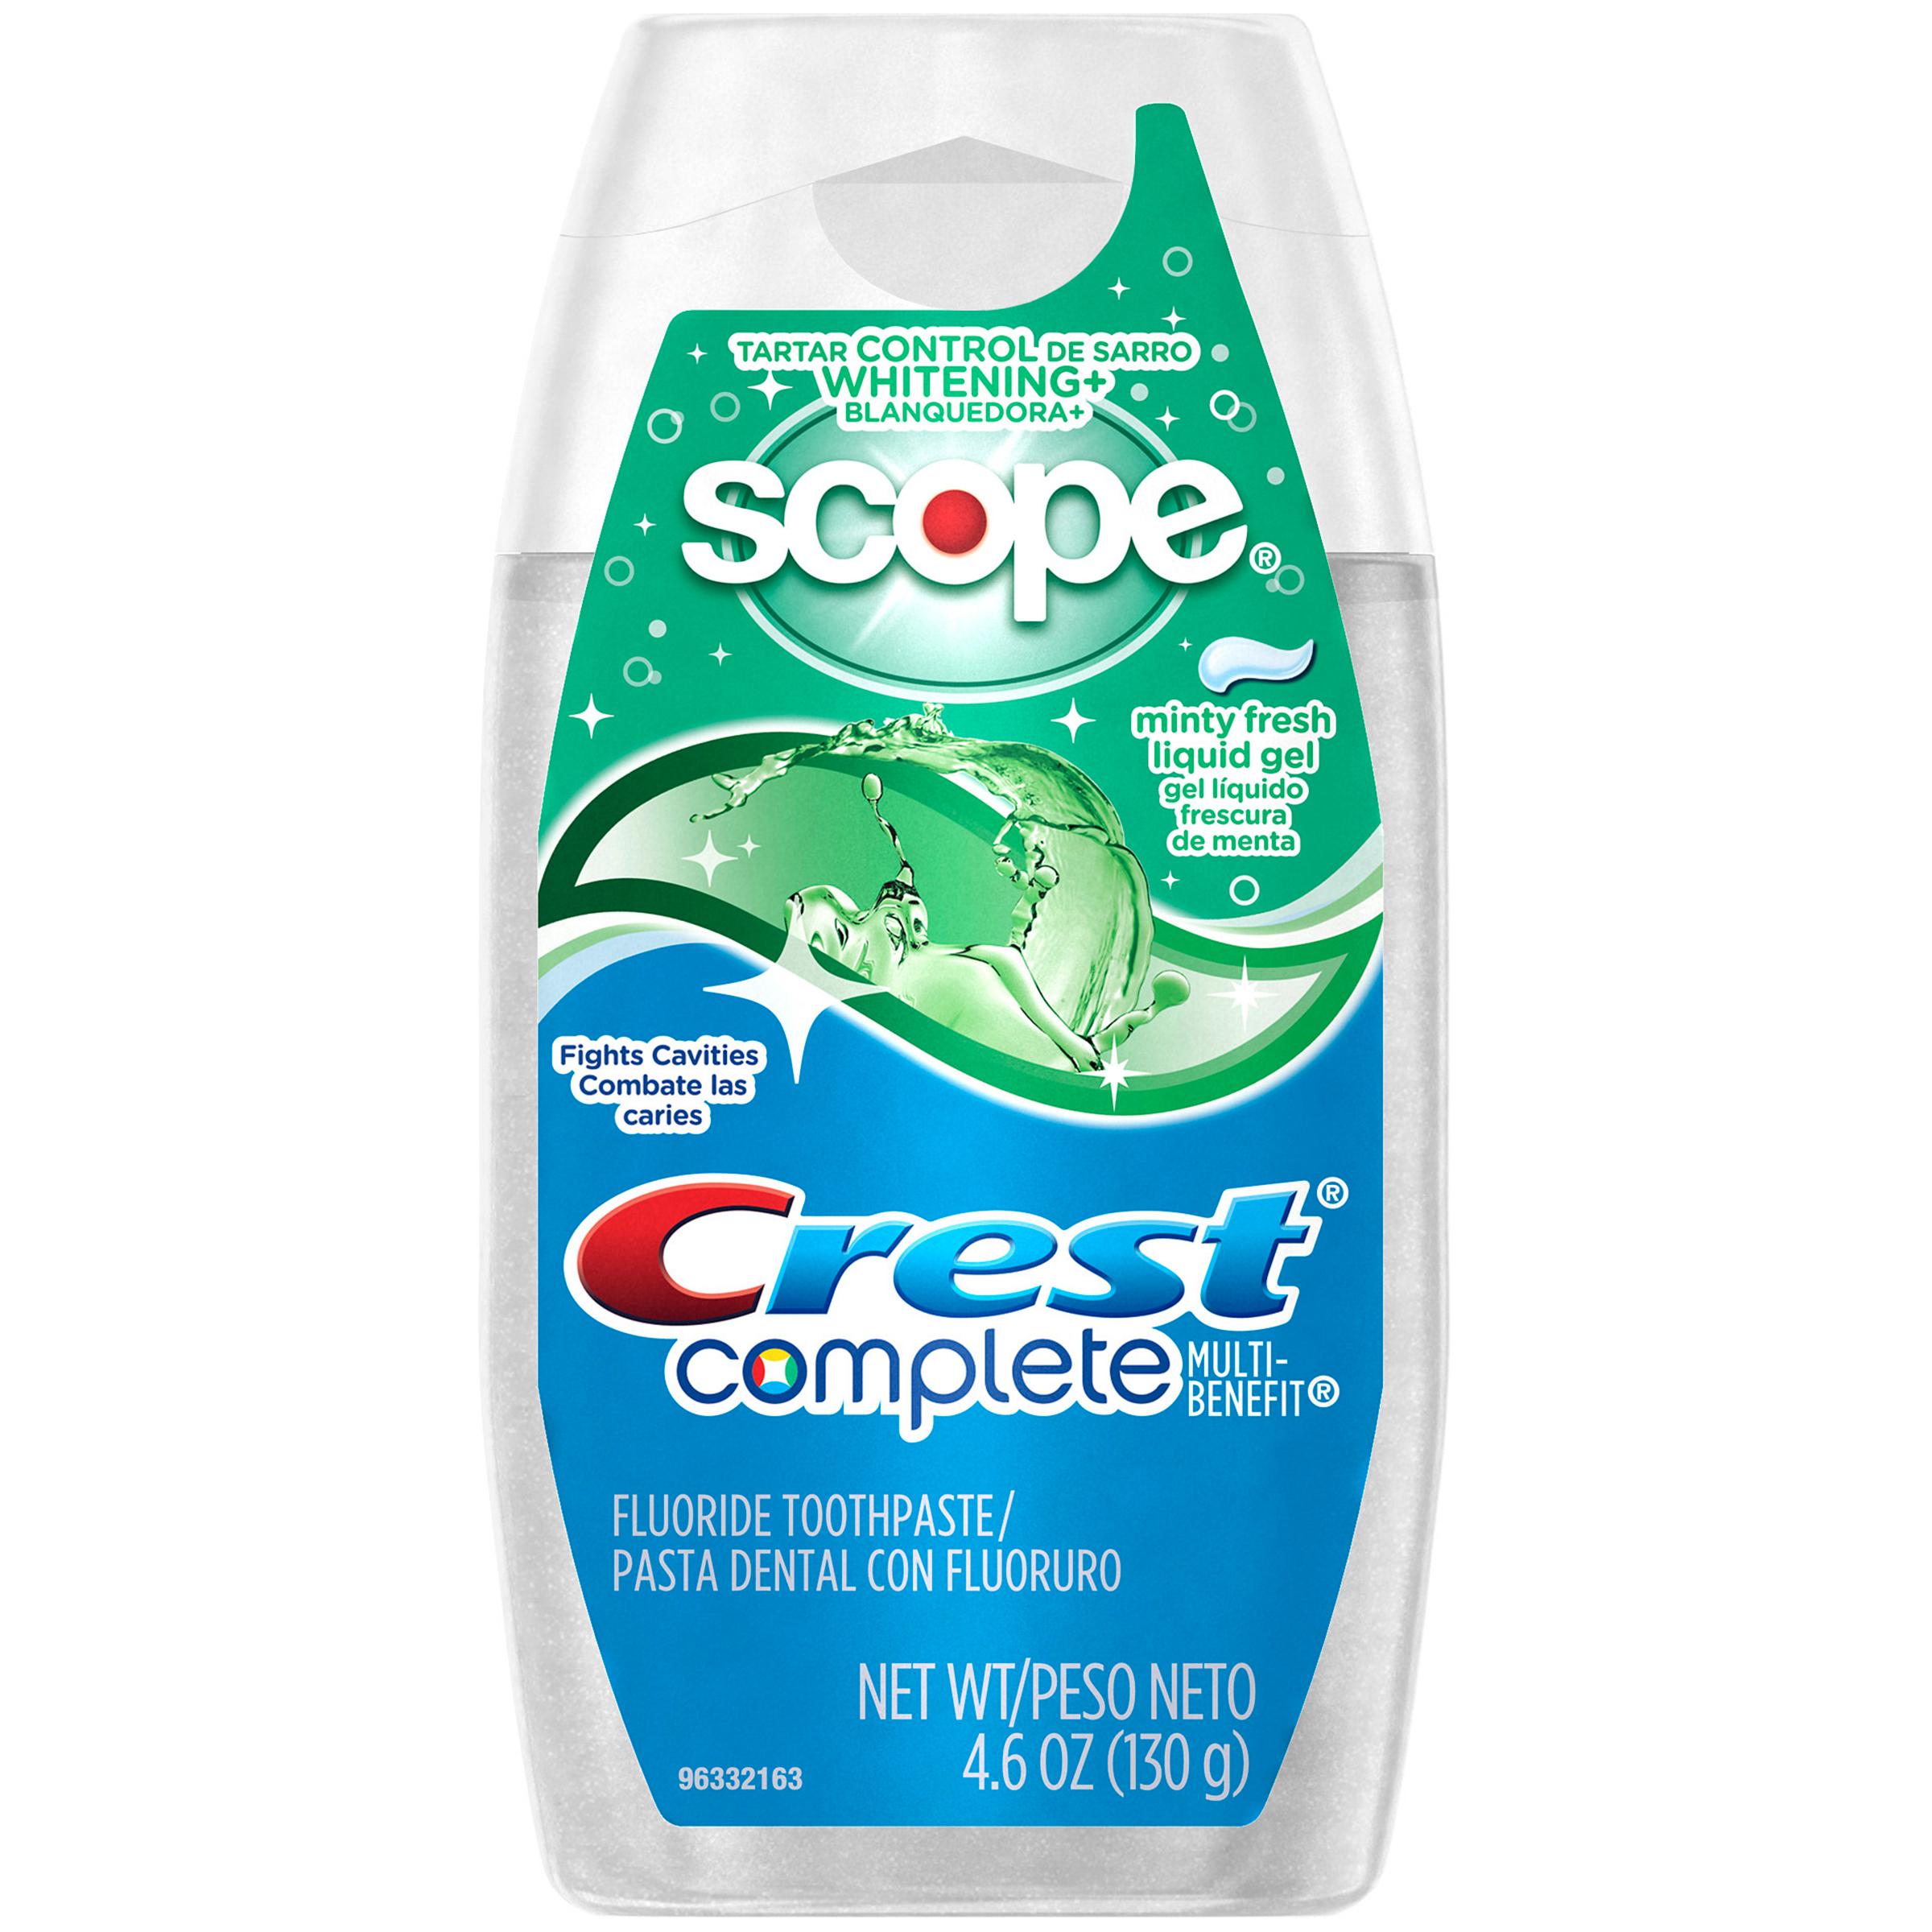 Crest Complete Multi-Benefit Toothpaste, Fluoride, Tartar Control Whitening + Scope, Minty Fresh Liquid Gel, 4.6 oz (130 g) PartNumber: 01345072000P KsnValue: 38780511